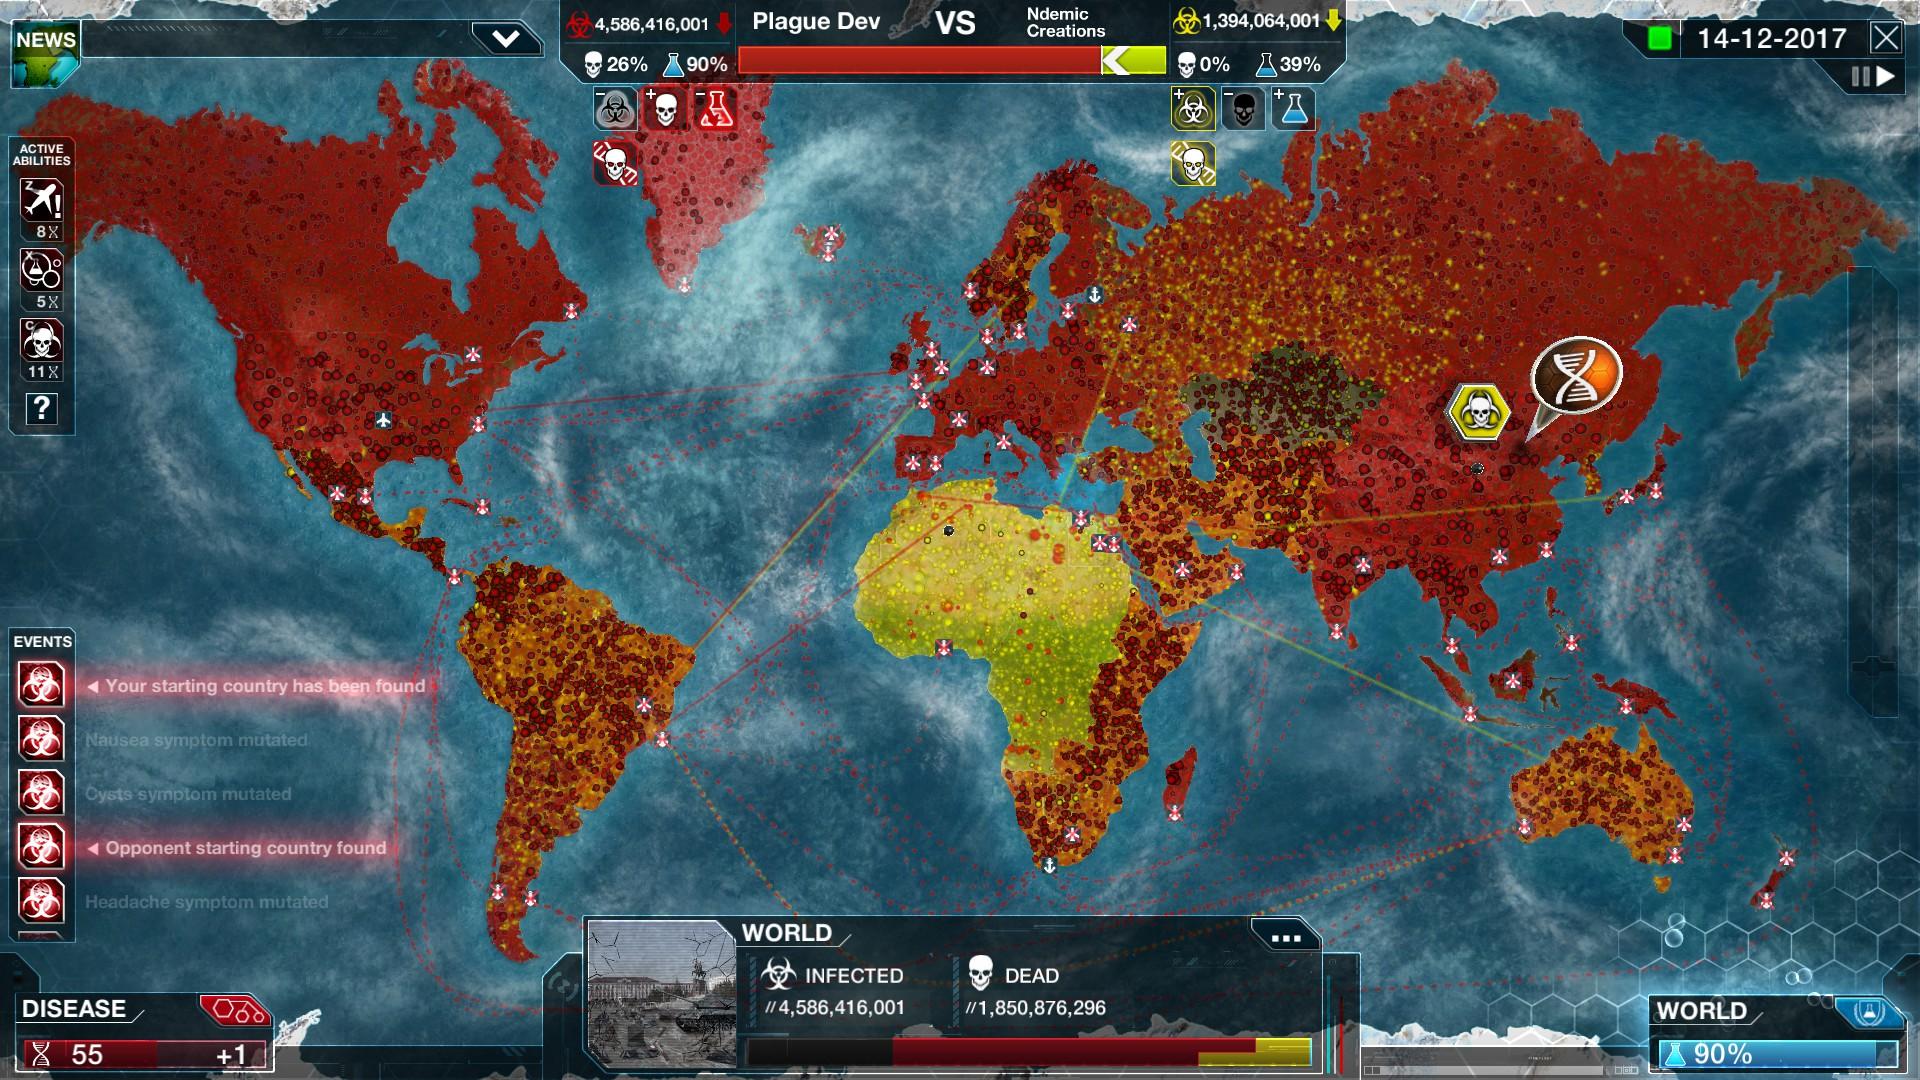 Plague Inc: Evolved on Steam